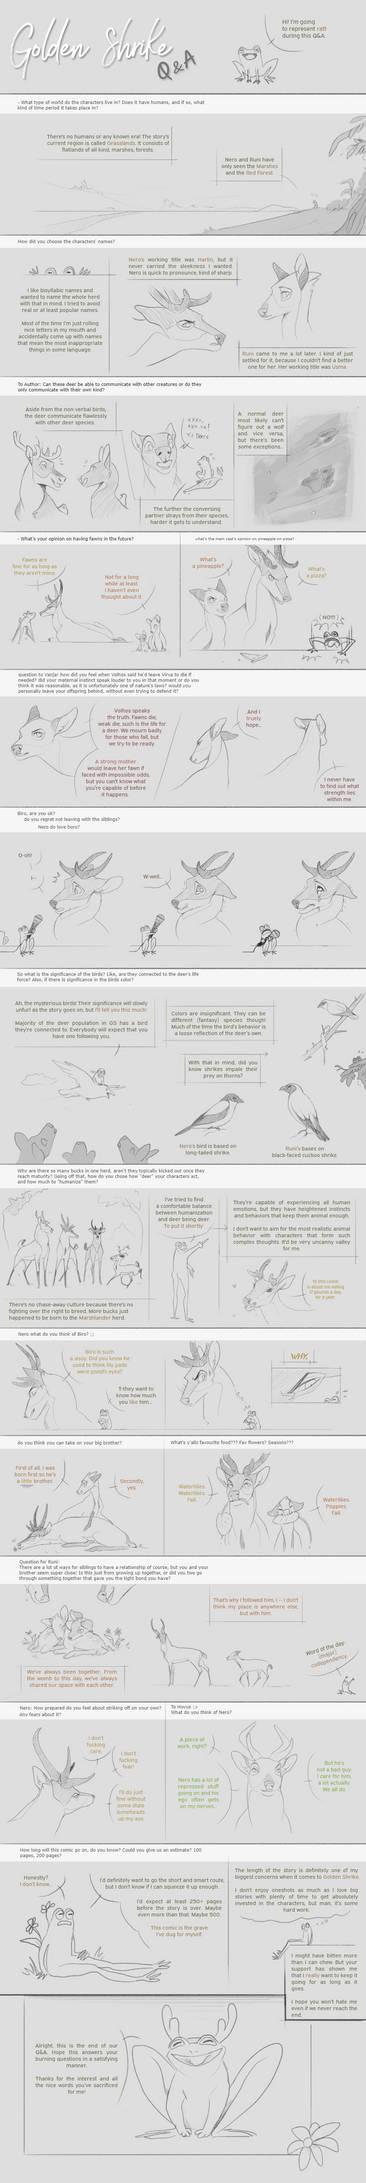 Golden Shrike - Q+A